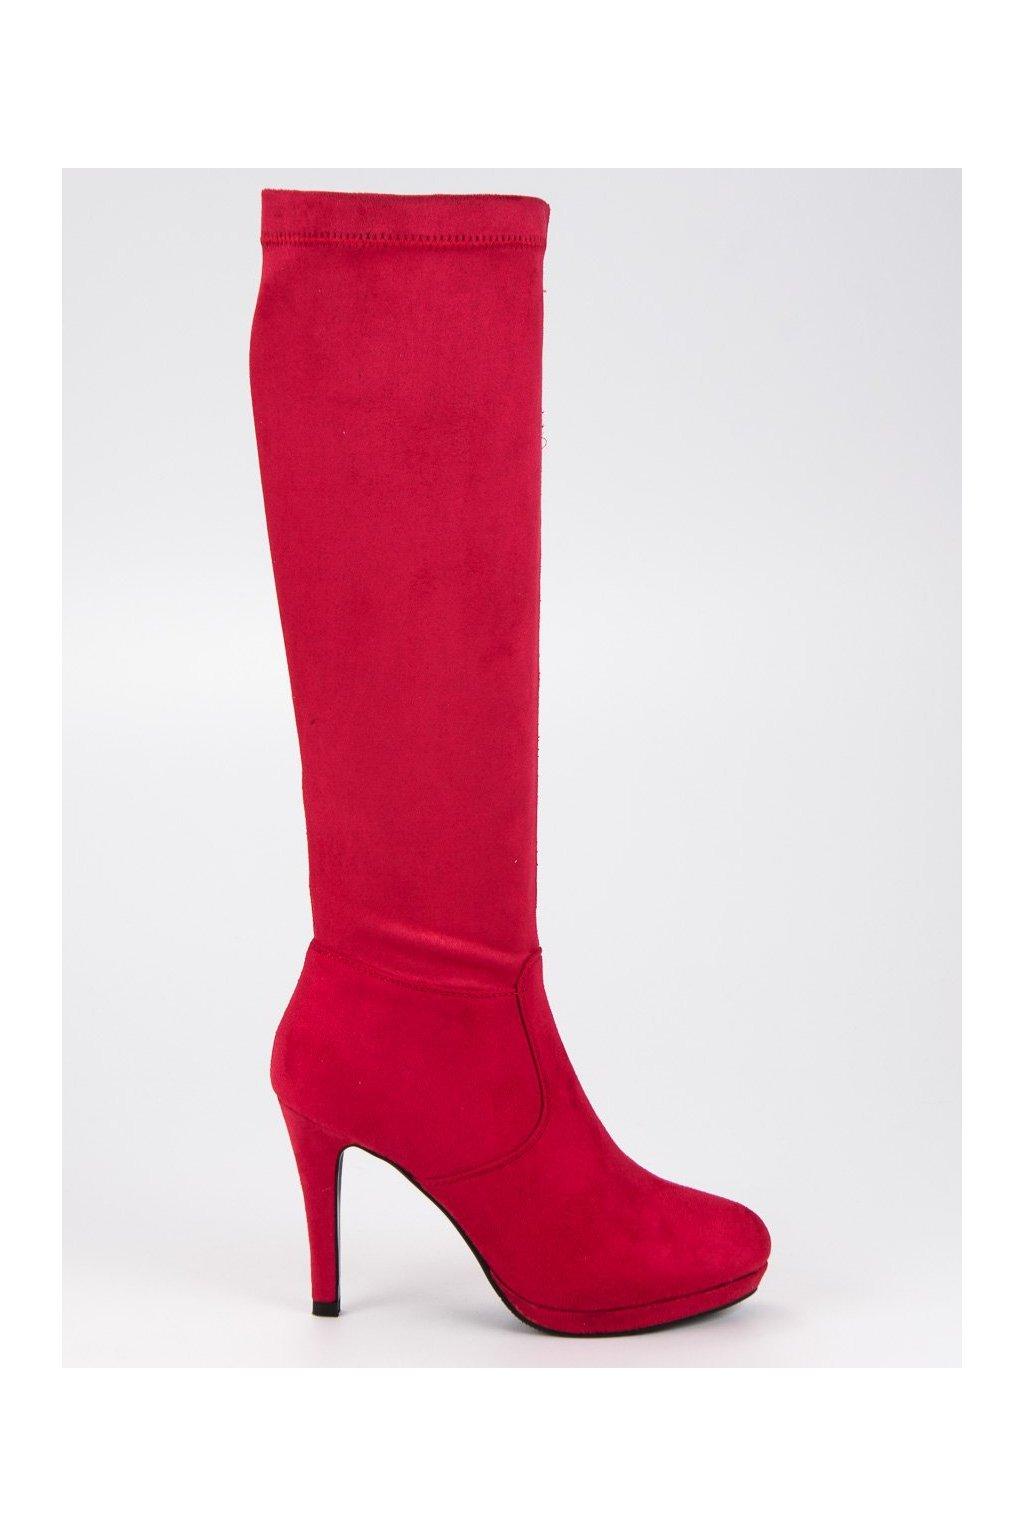 Dámske červené čižmy pod koleno Small Swann cc3e3c09767